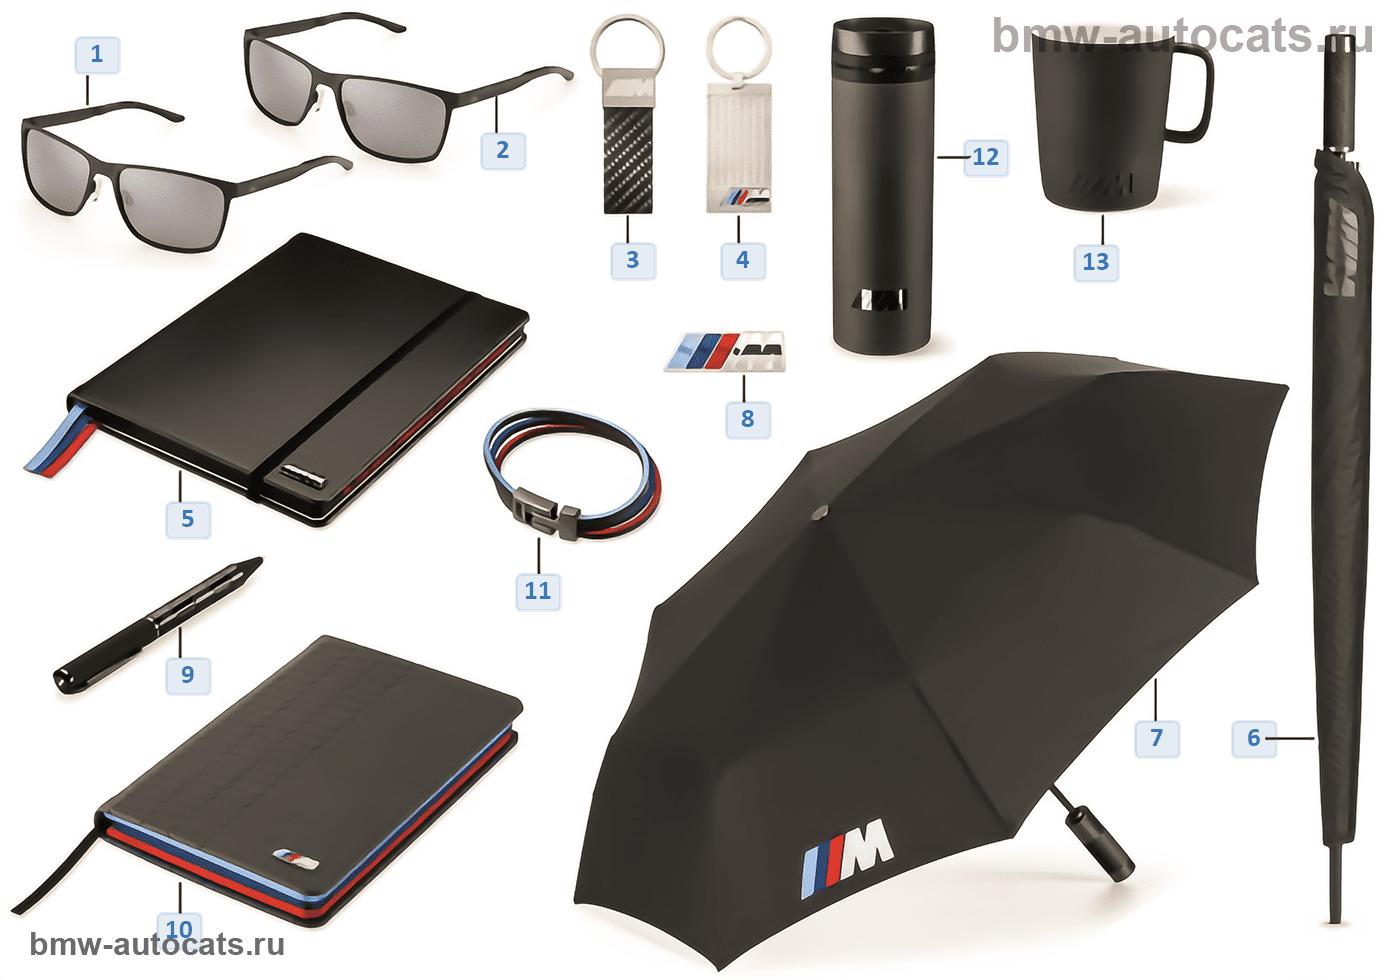 BMW M Collection — аксессуары 16-18